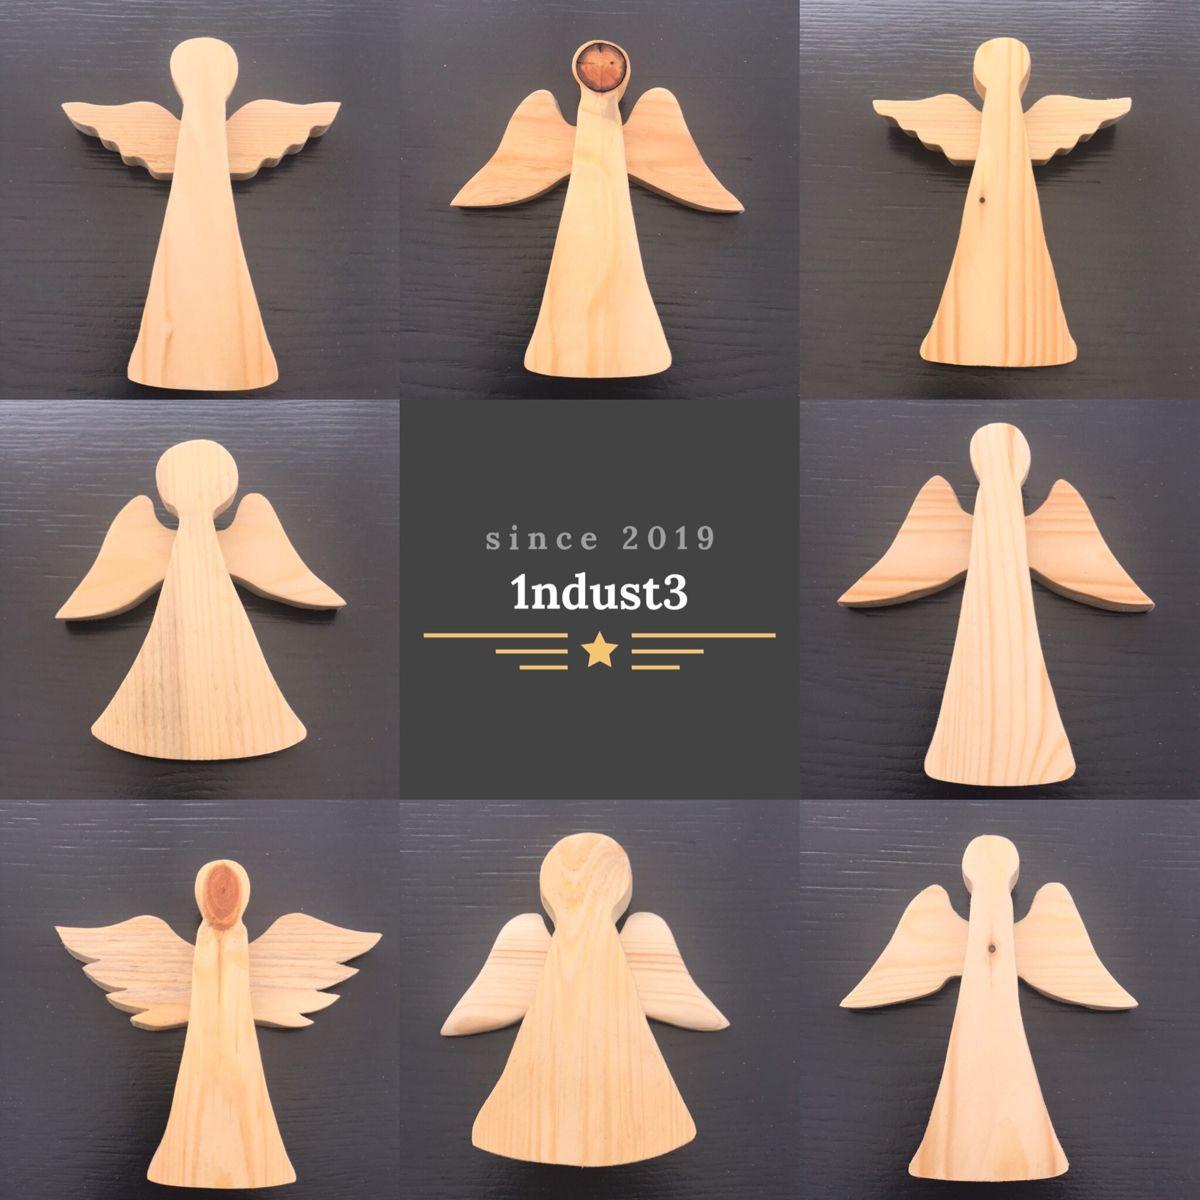 Angel - Engel handmade by 1ndust3  #1ndust3 #angel #engel #wood #hout #holz #woodworking #houtbewerking #holzbearbeitung #wooddecor #houtdecoratie #holzdeko #handmade #handgemaakt #handwerk #handgemachte #reclaimed #reclaimedwoodwallart #reclaimedwood #christmas #xmas #kerstmis #kerstengel #christmasangels #weihnachten #weihnachtsdeko #kerstdecoratie #kerstdeco #palletwood #palletwoodart #xmasdecorations #xmasdecor